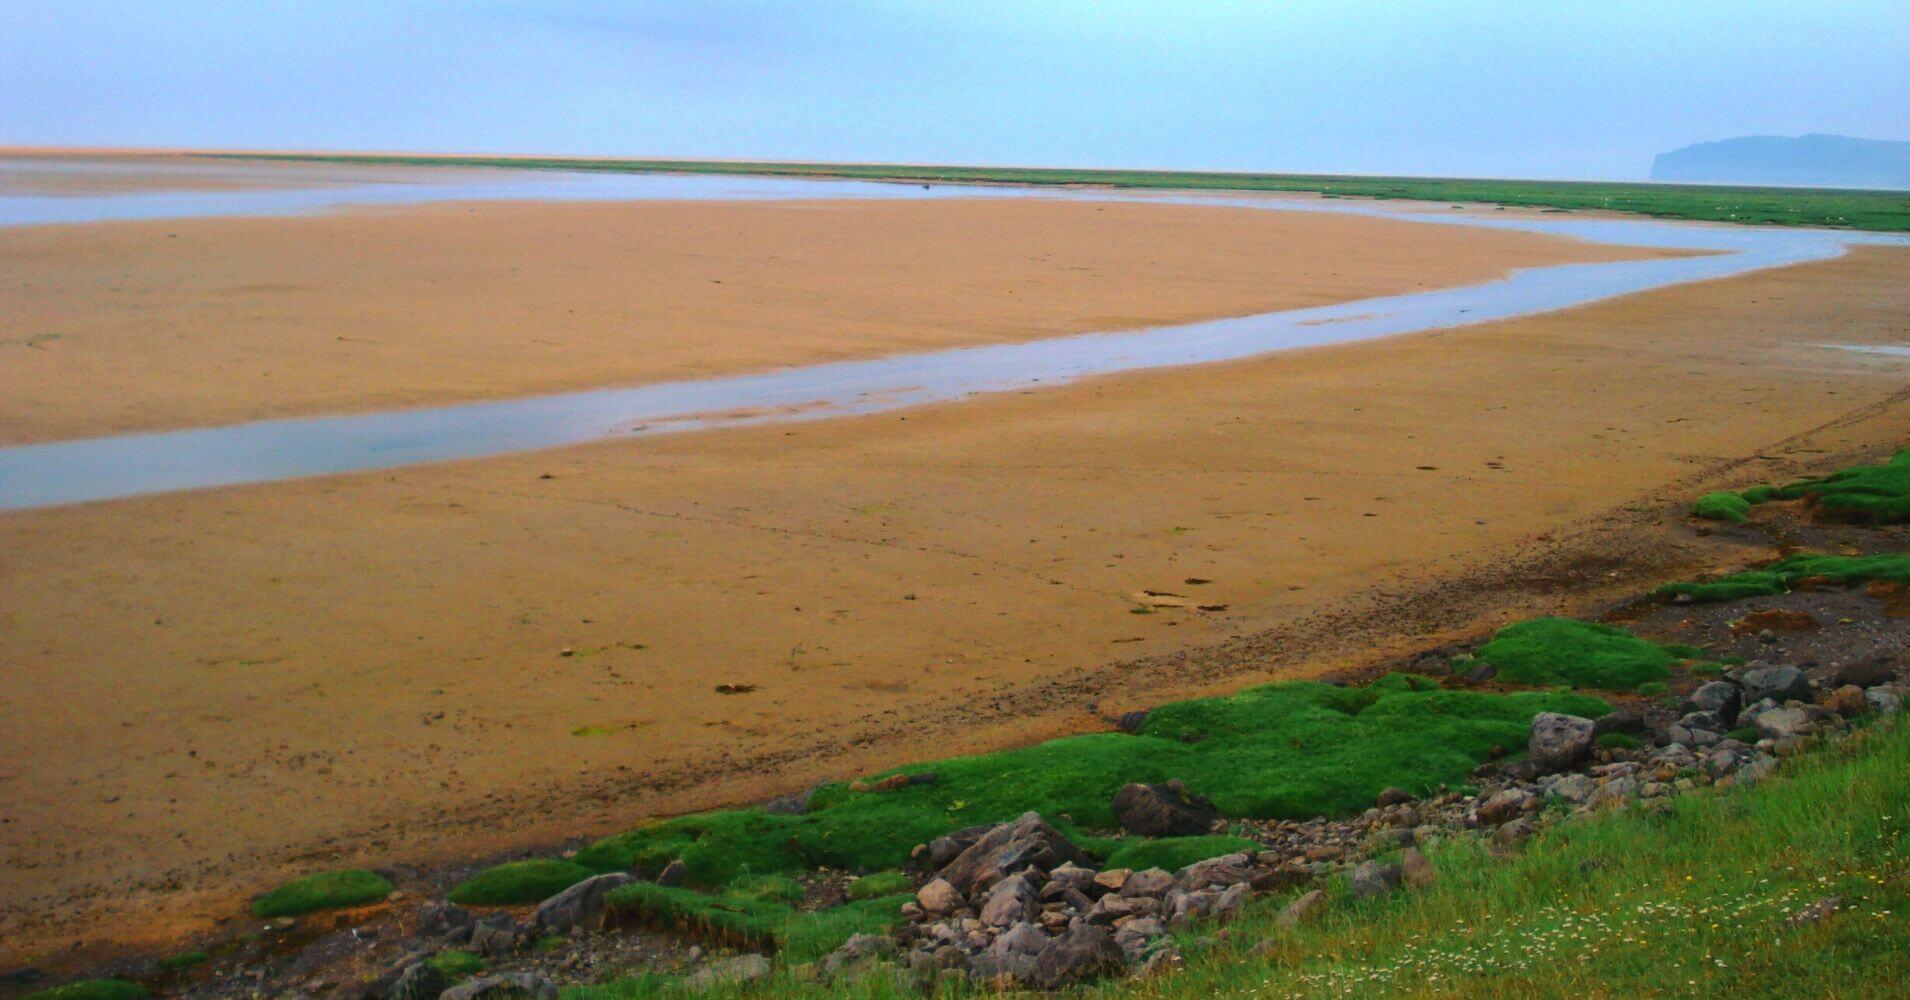 Playa de Rauðisandur. Fiordos del Oeste. Vestfirðir. Islandia.